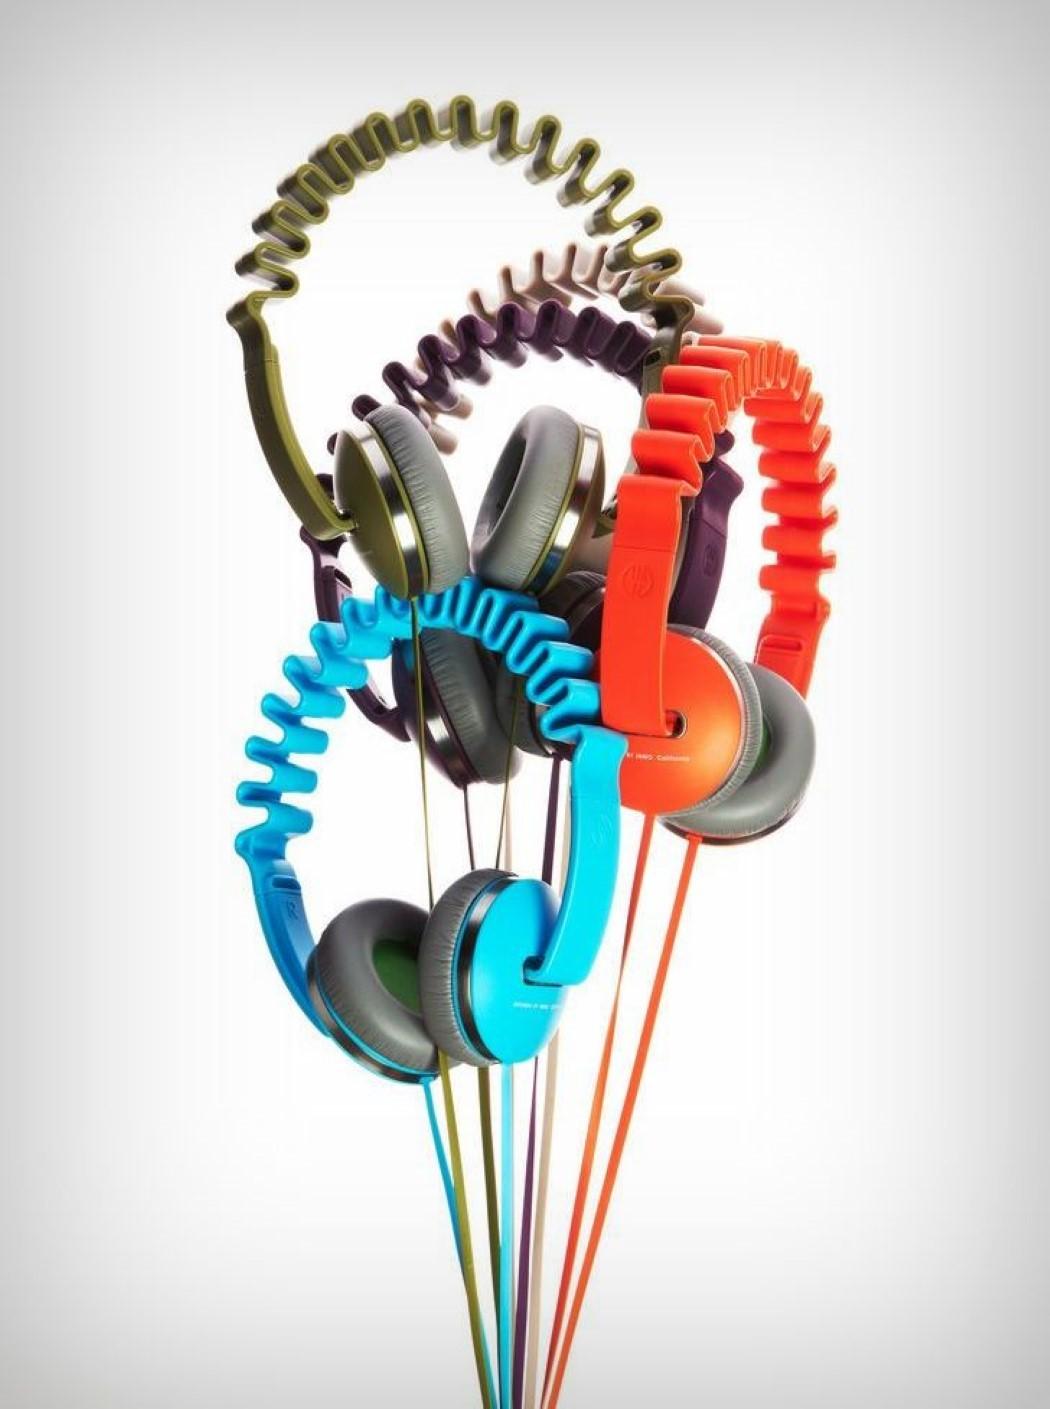 innowave_headphones_6